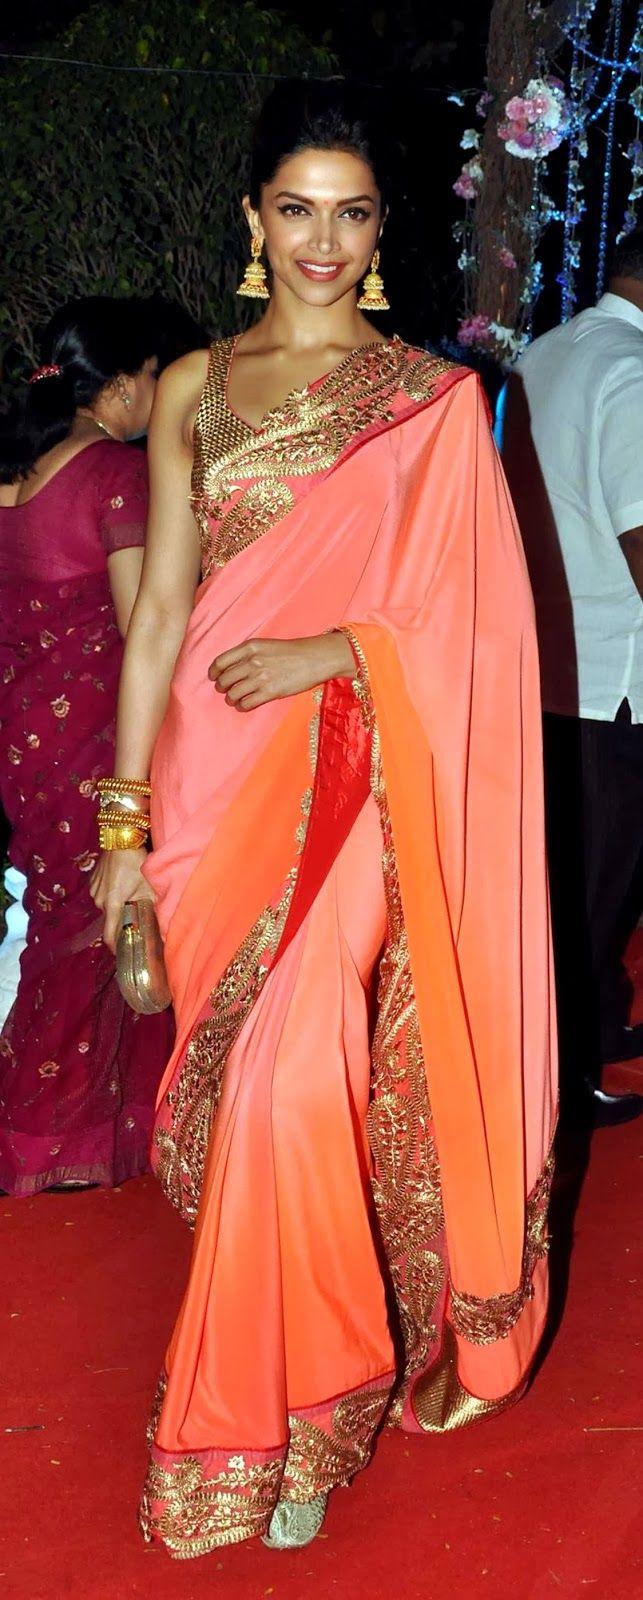 2014 IIFA Awards: Complete List of Nominees : Deepika and 'Bhaag Milkha Bhaag' Lead